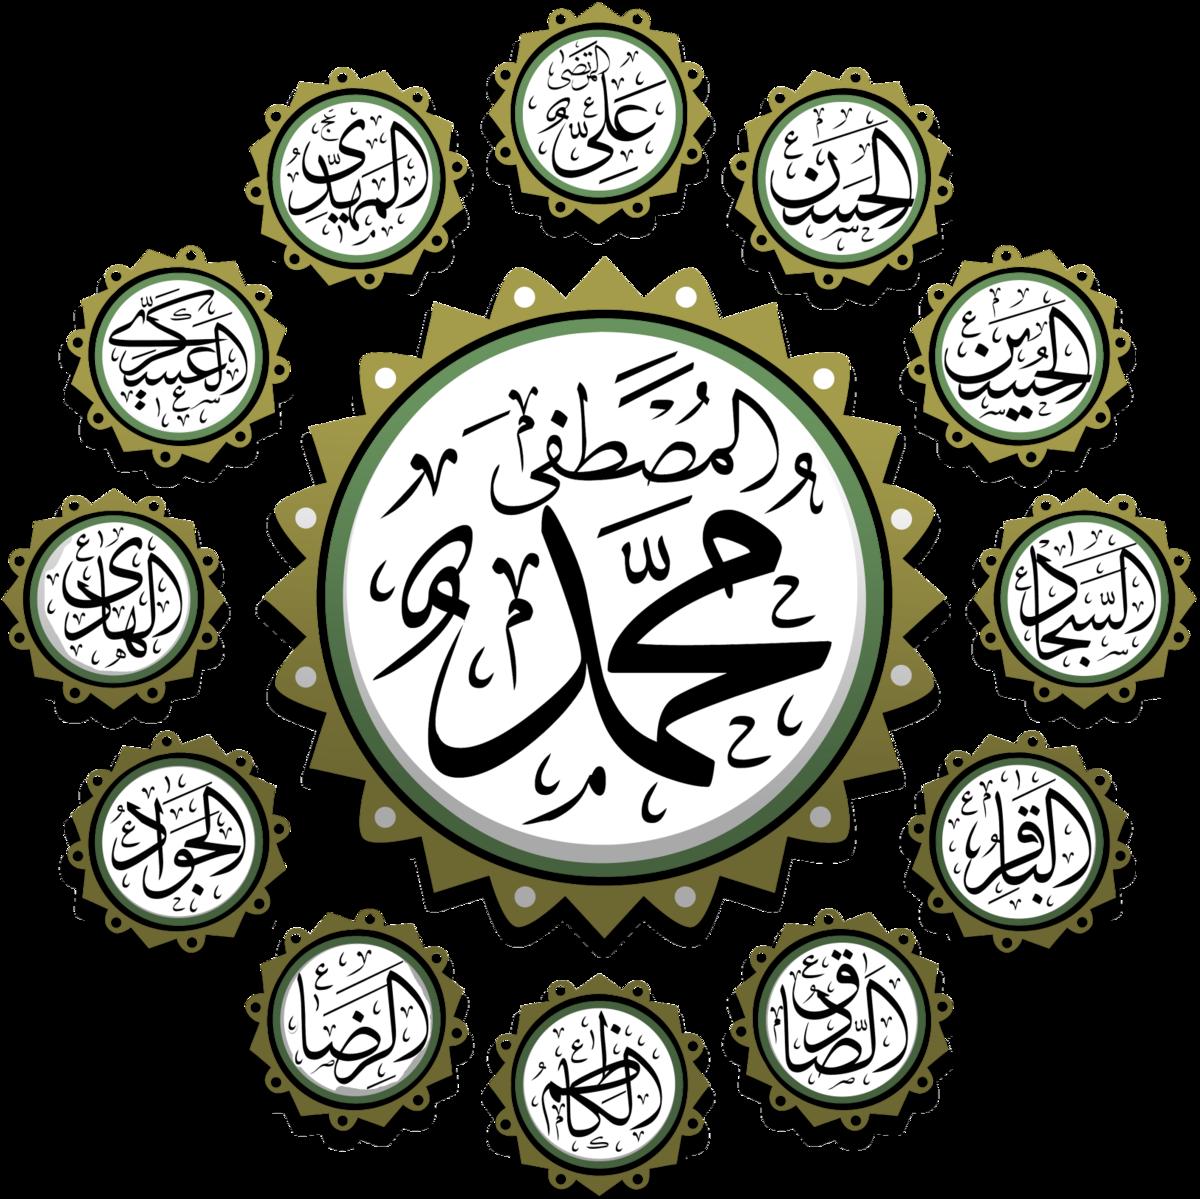 The Twelve Imams - Wikipedia